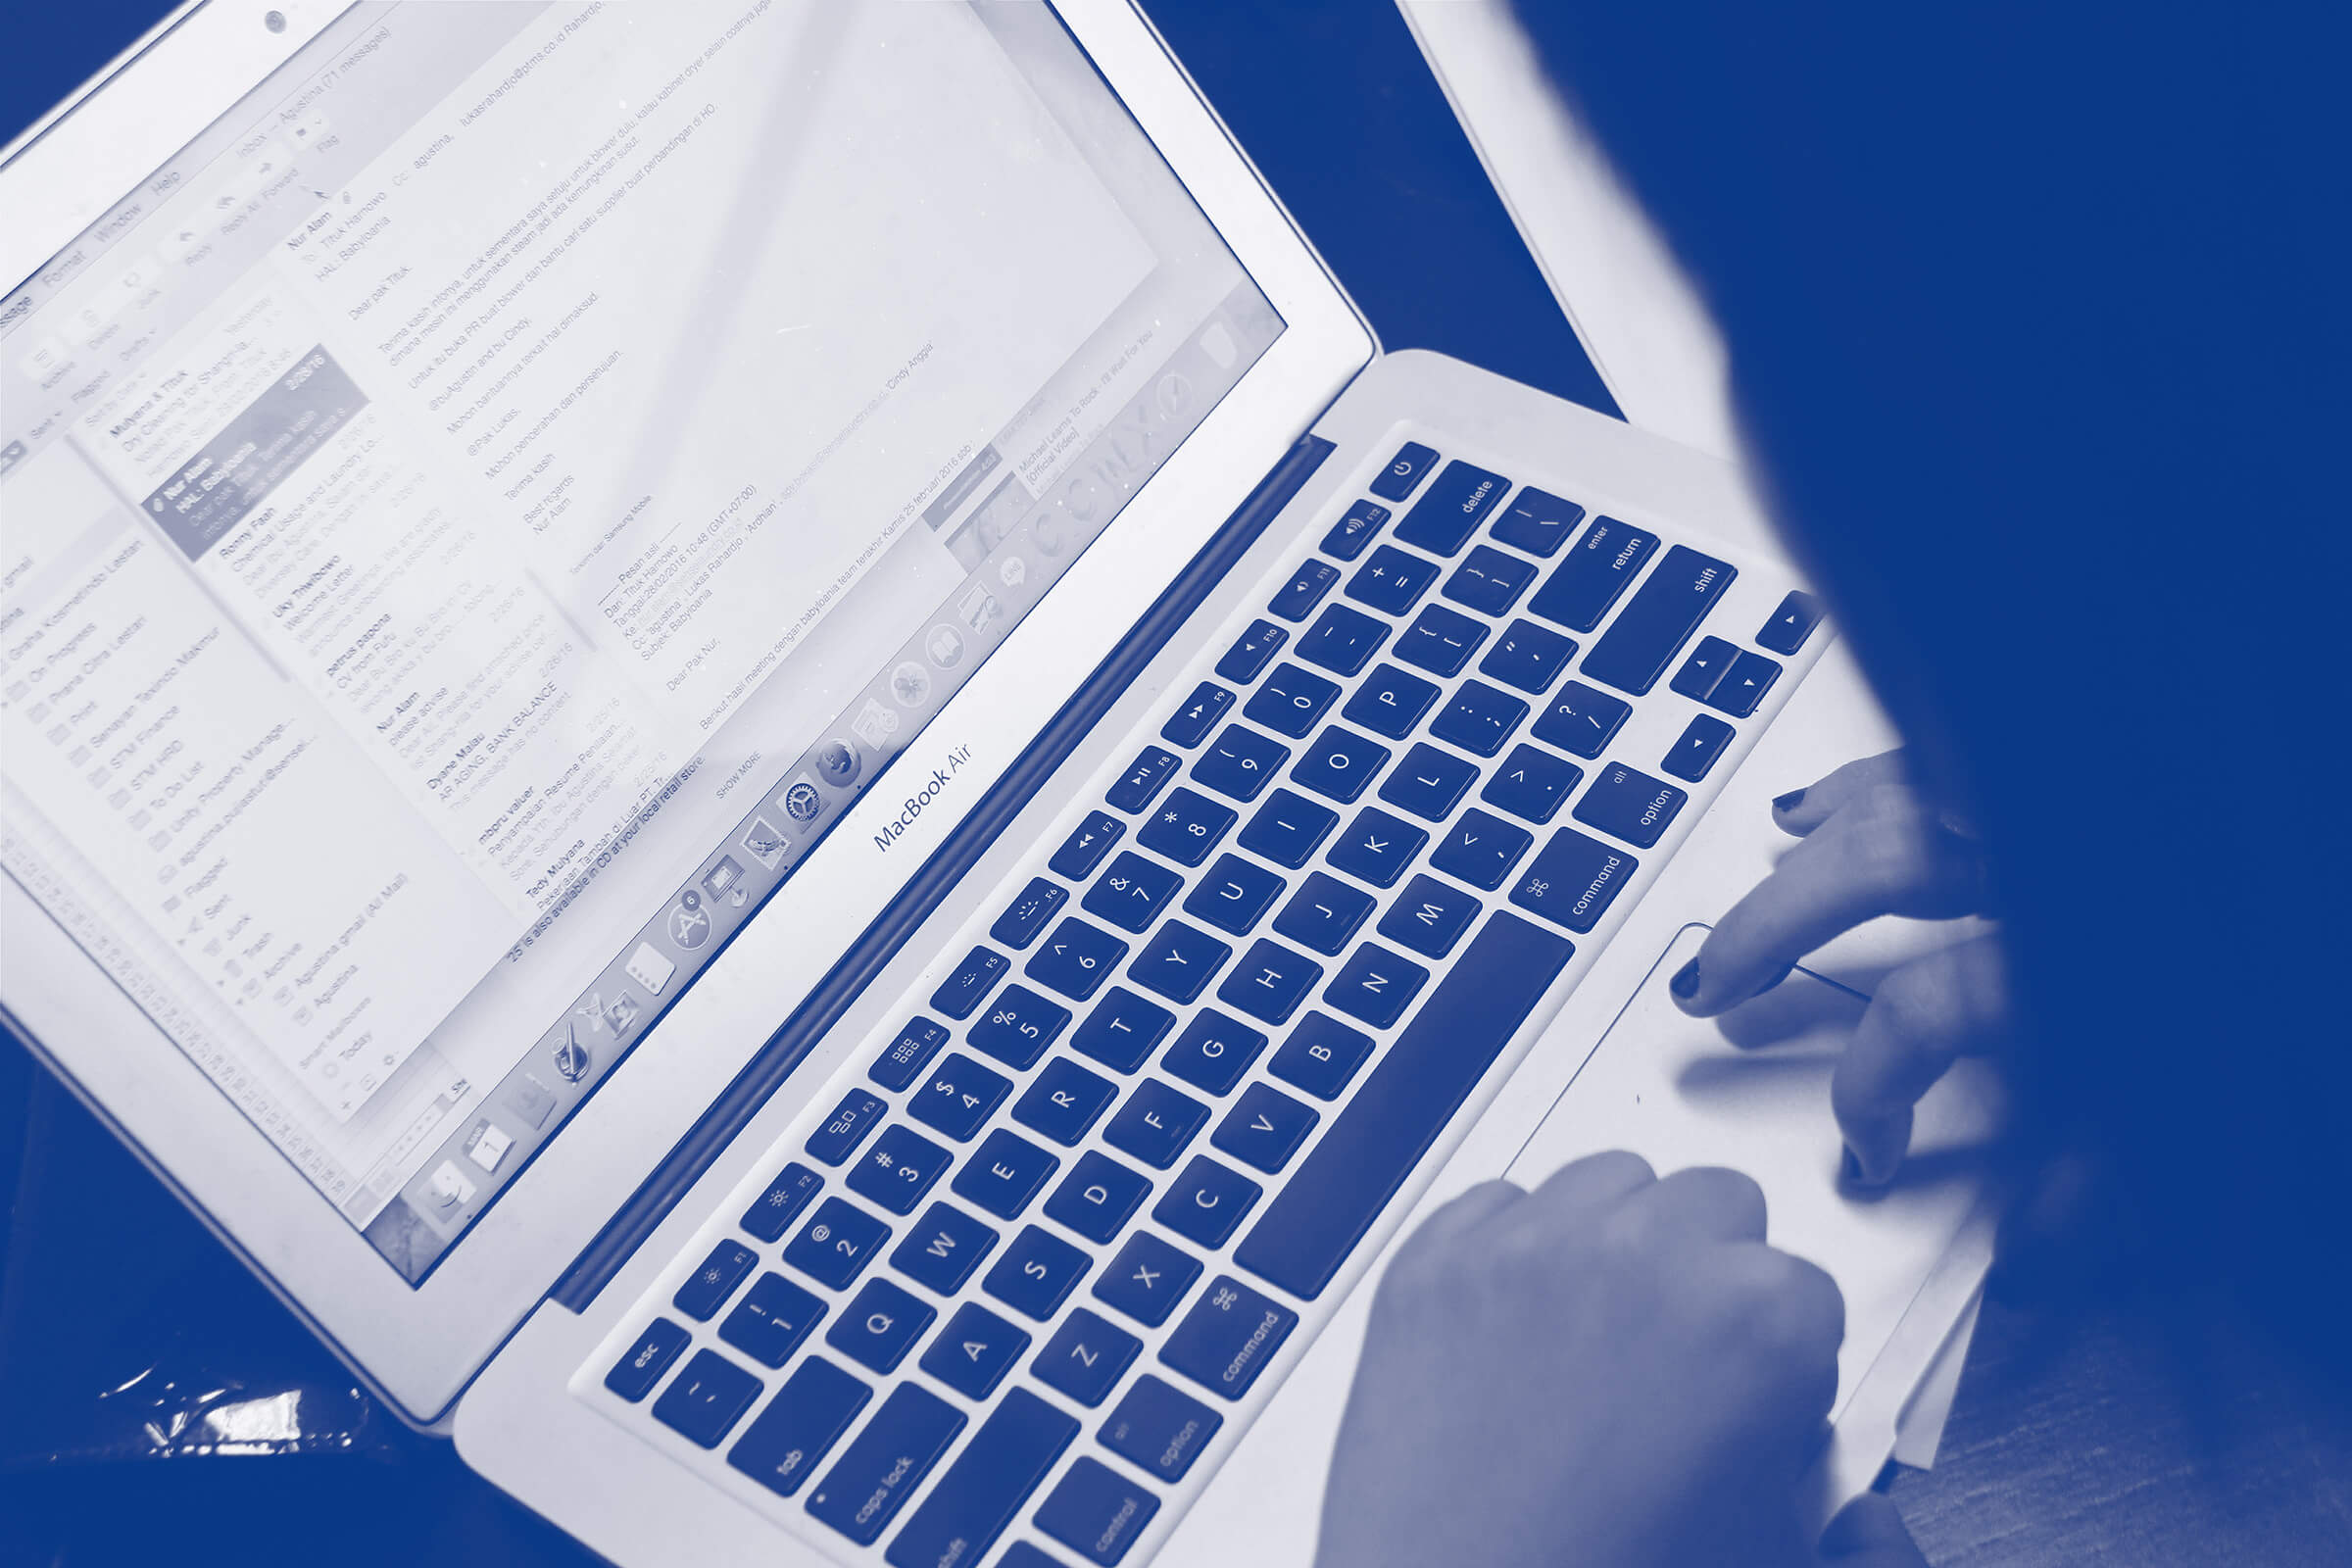 Writing an email to WordPress development agency